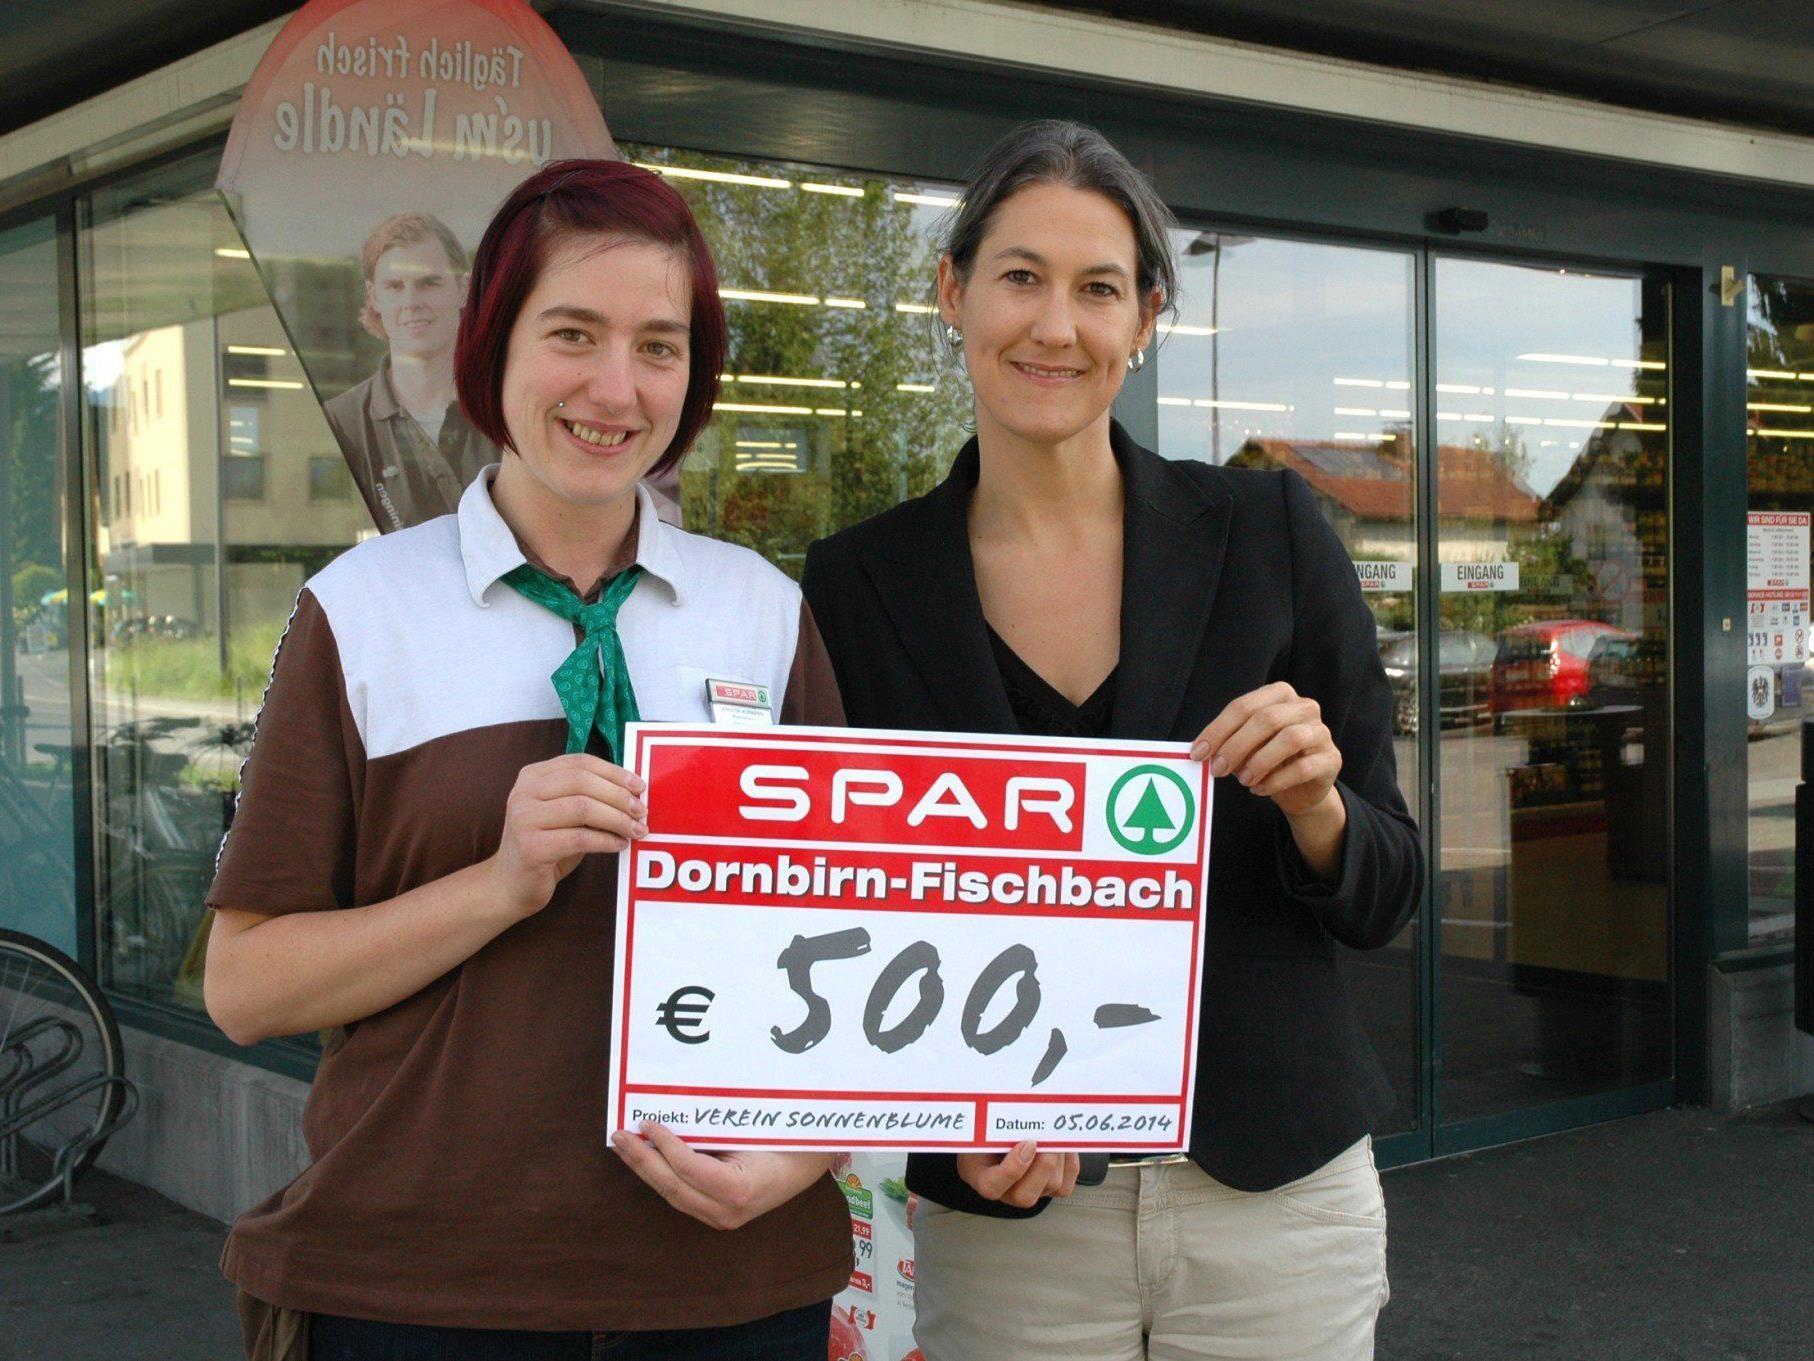 Marktleiterin Jennifer Hubmann (links) übergibt den Spendenscheck an Manuela Ortner, Obfrau des Vereins Sonnenblume.